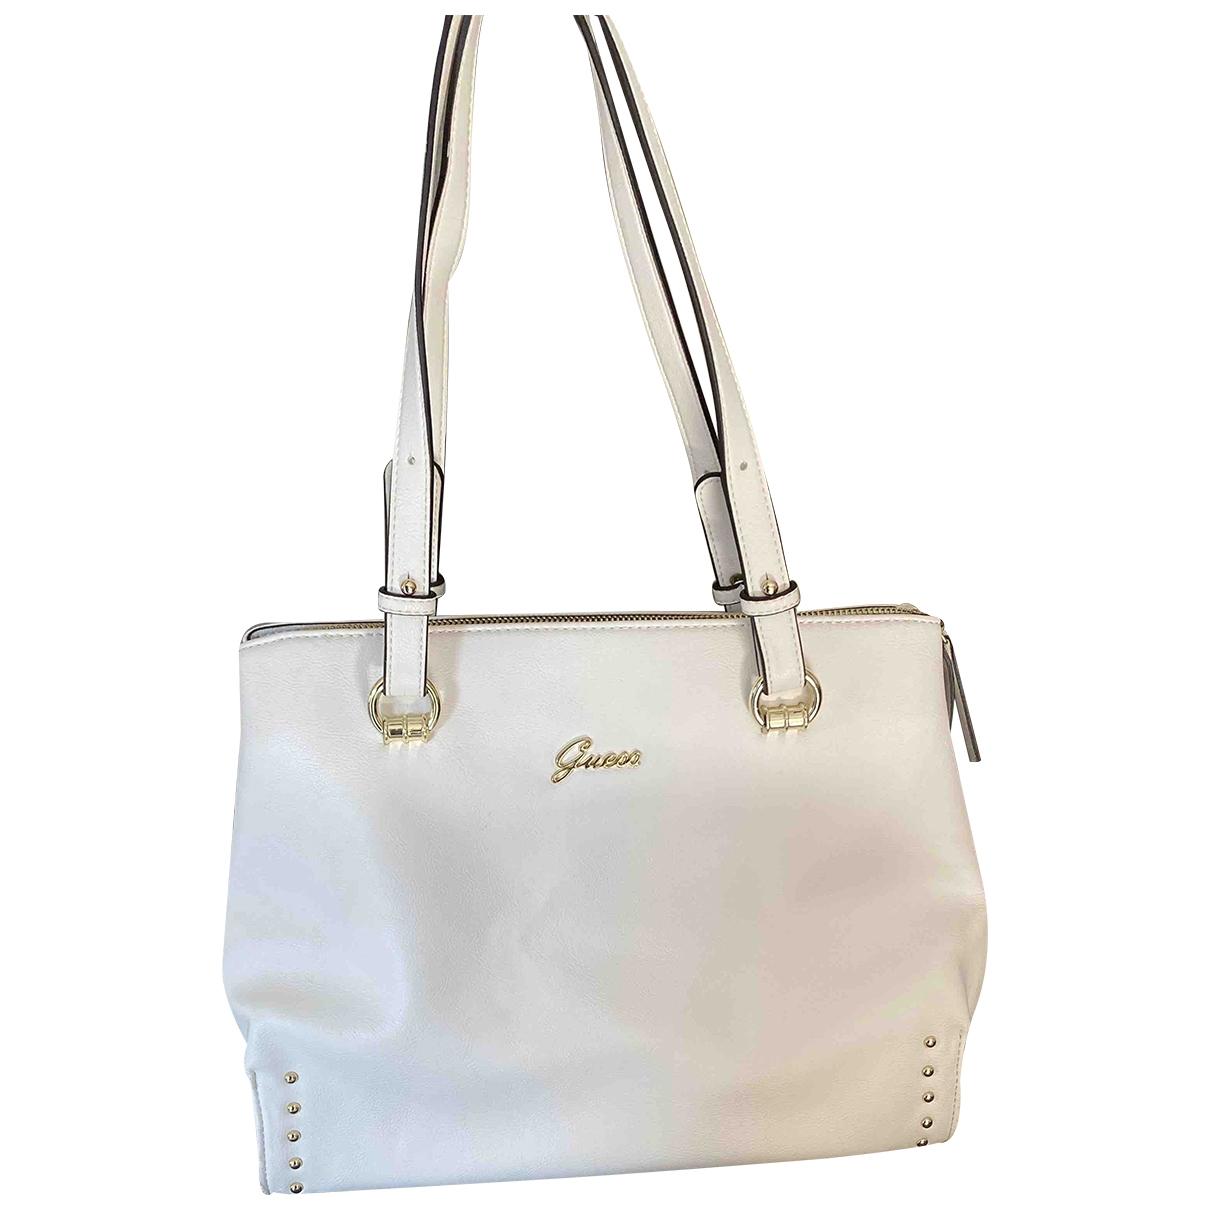 Guess \N White Leather handbag for Women \N